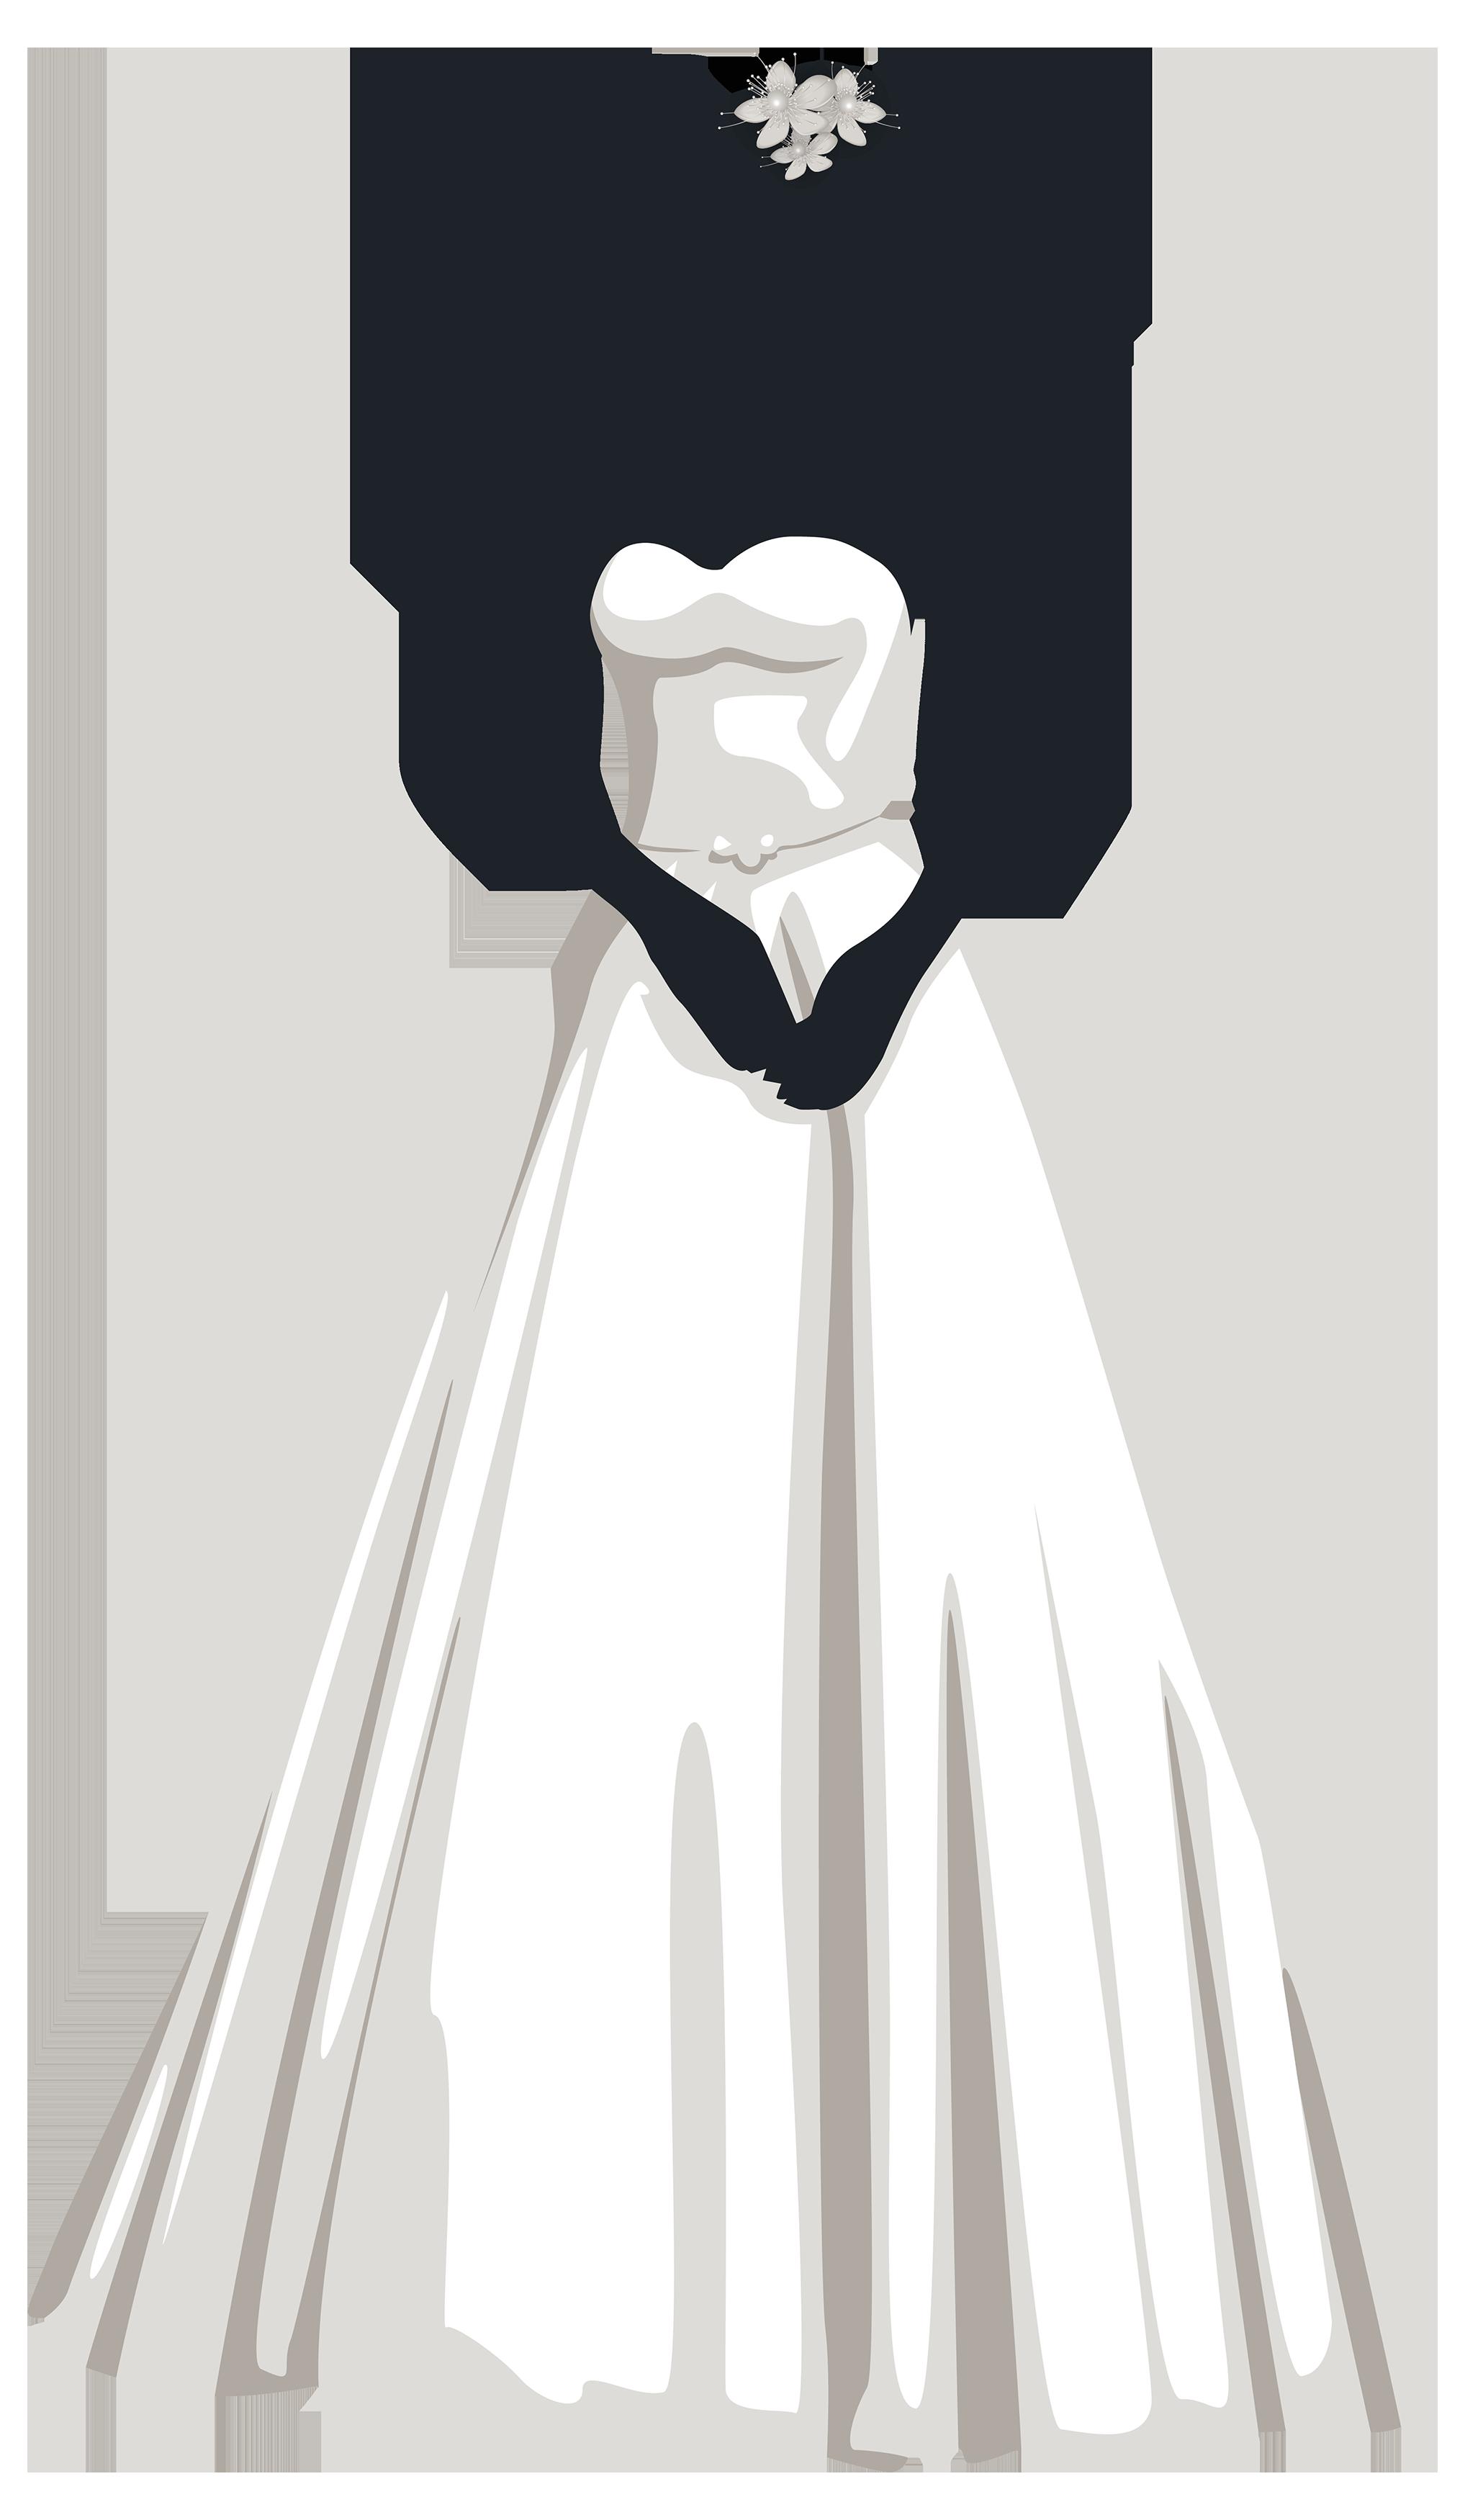 Bride Silhouette PNG Clip Art | Imagen 15 Años | Pinterest ...